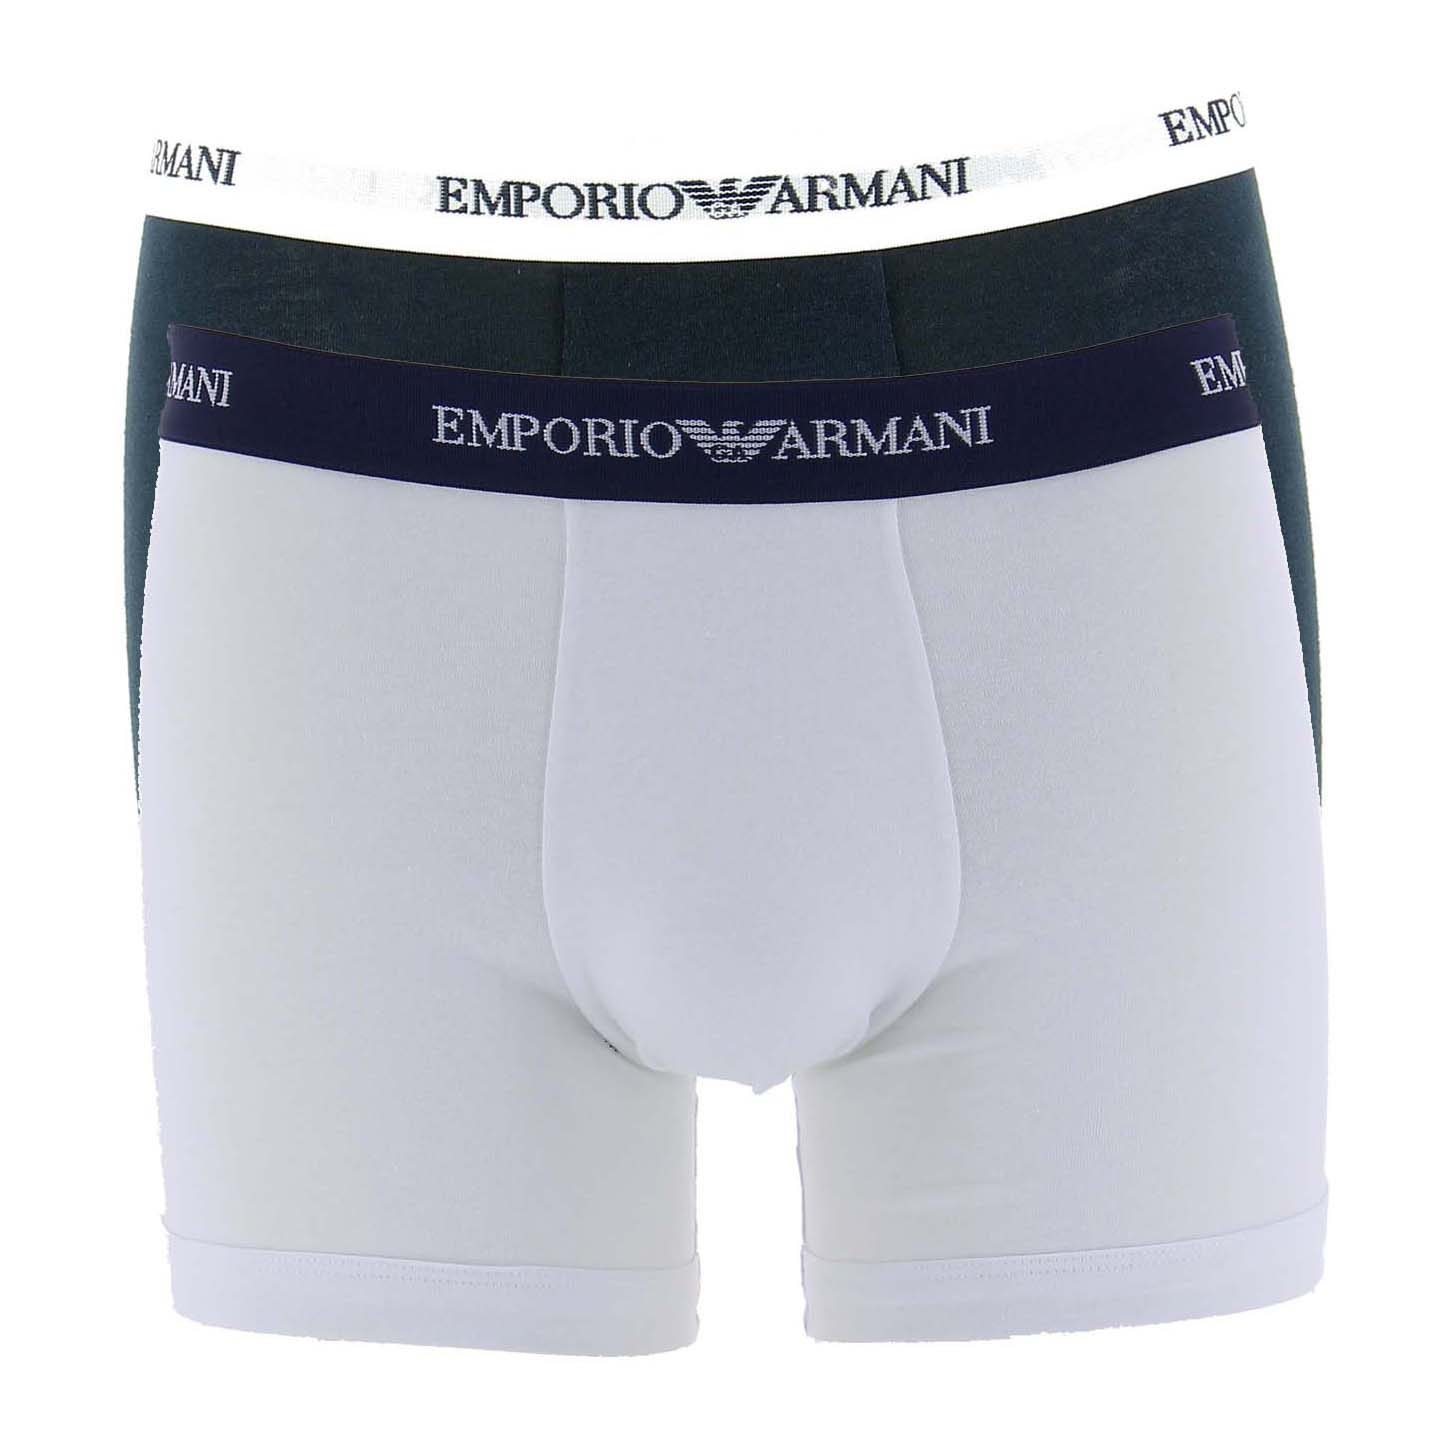 Pack 2 Boxers Briefs Emporio Armani 111268 C717